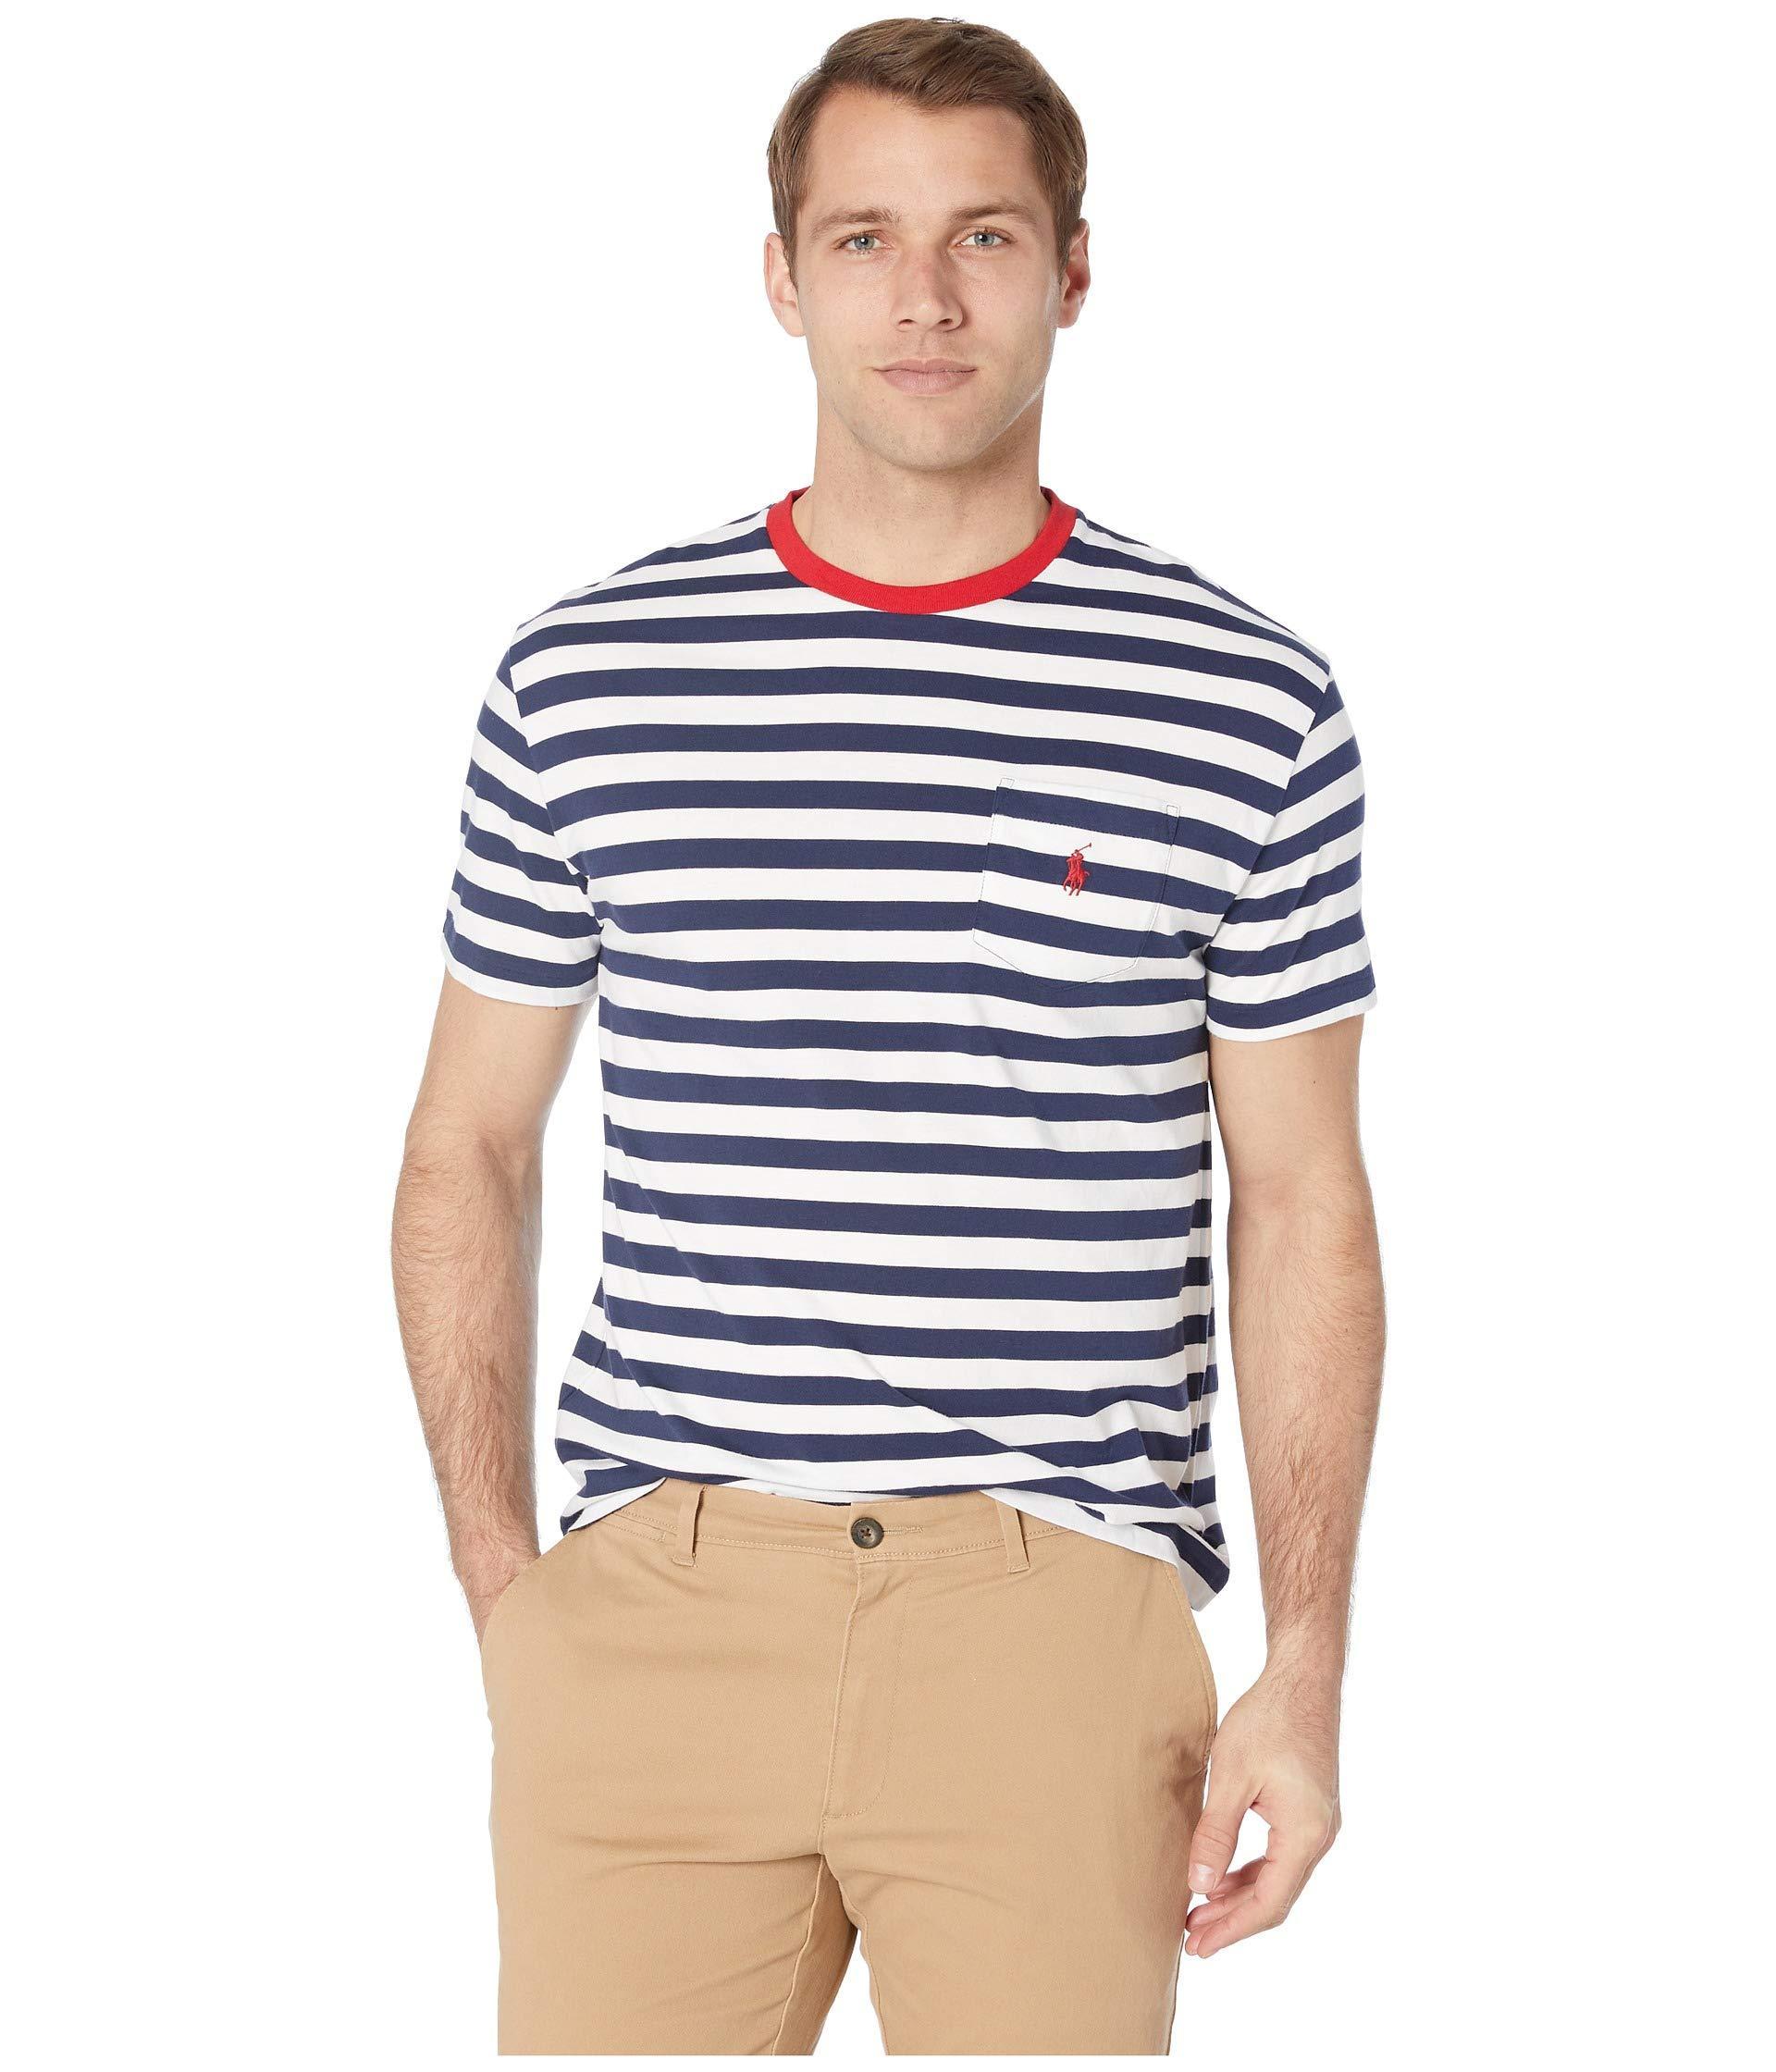 e0c10ed8ace0 Lyst - Polo Ralph Lauren Short Sleeve Classic Fit Pocket Tee (cruise ...